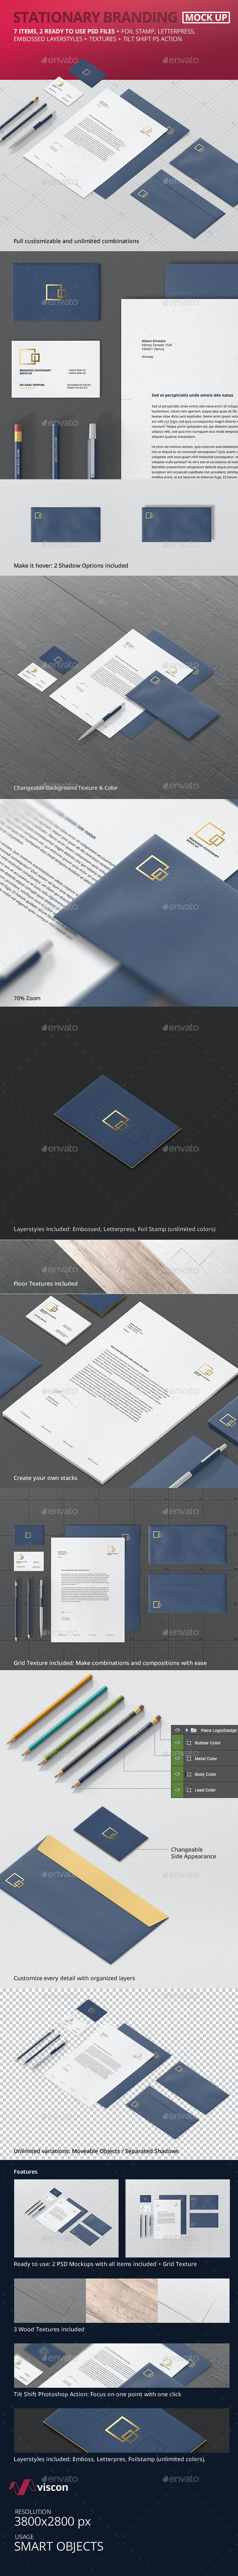 Stationary / Branding Mock-Up - Stationery Print